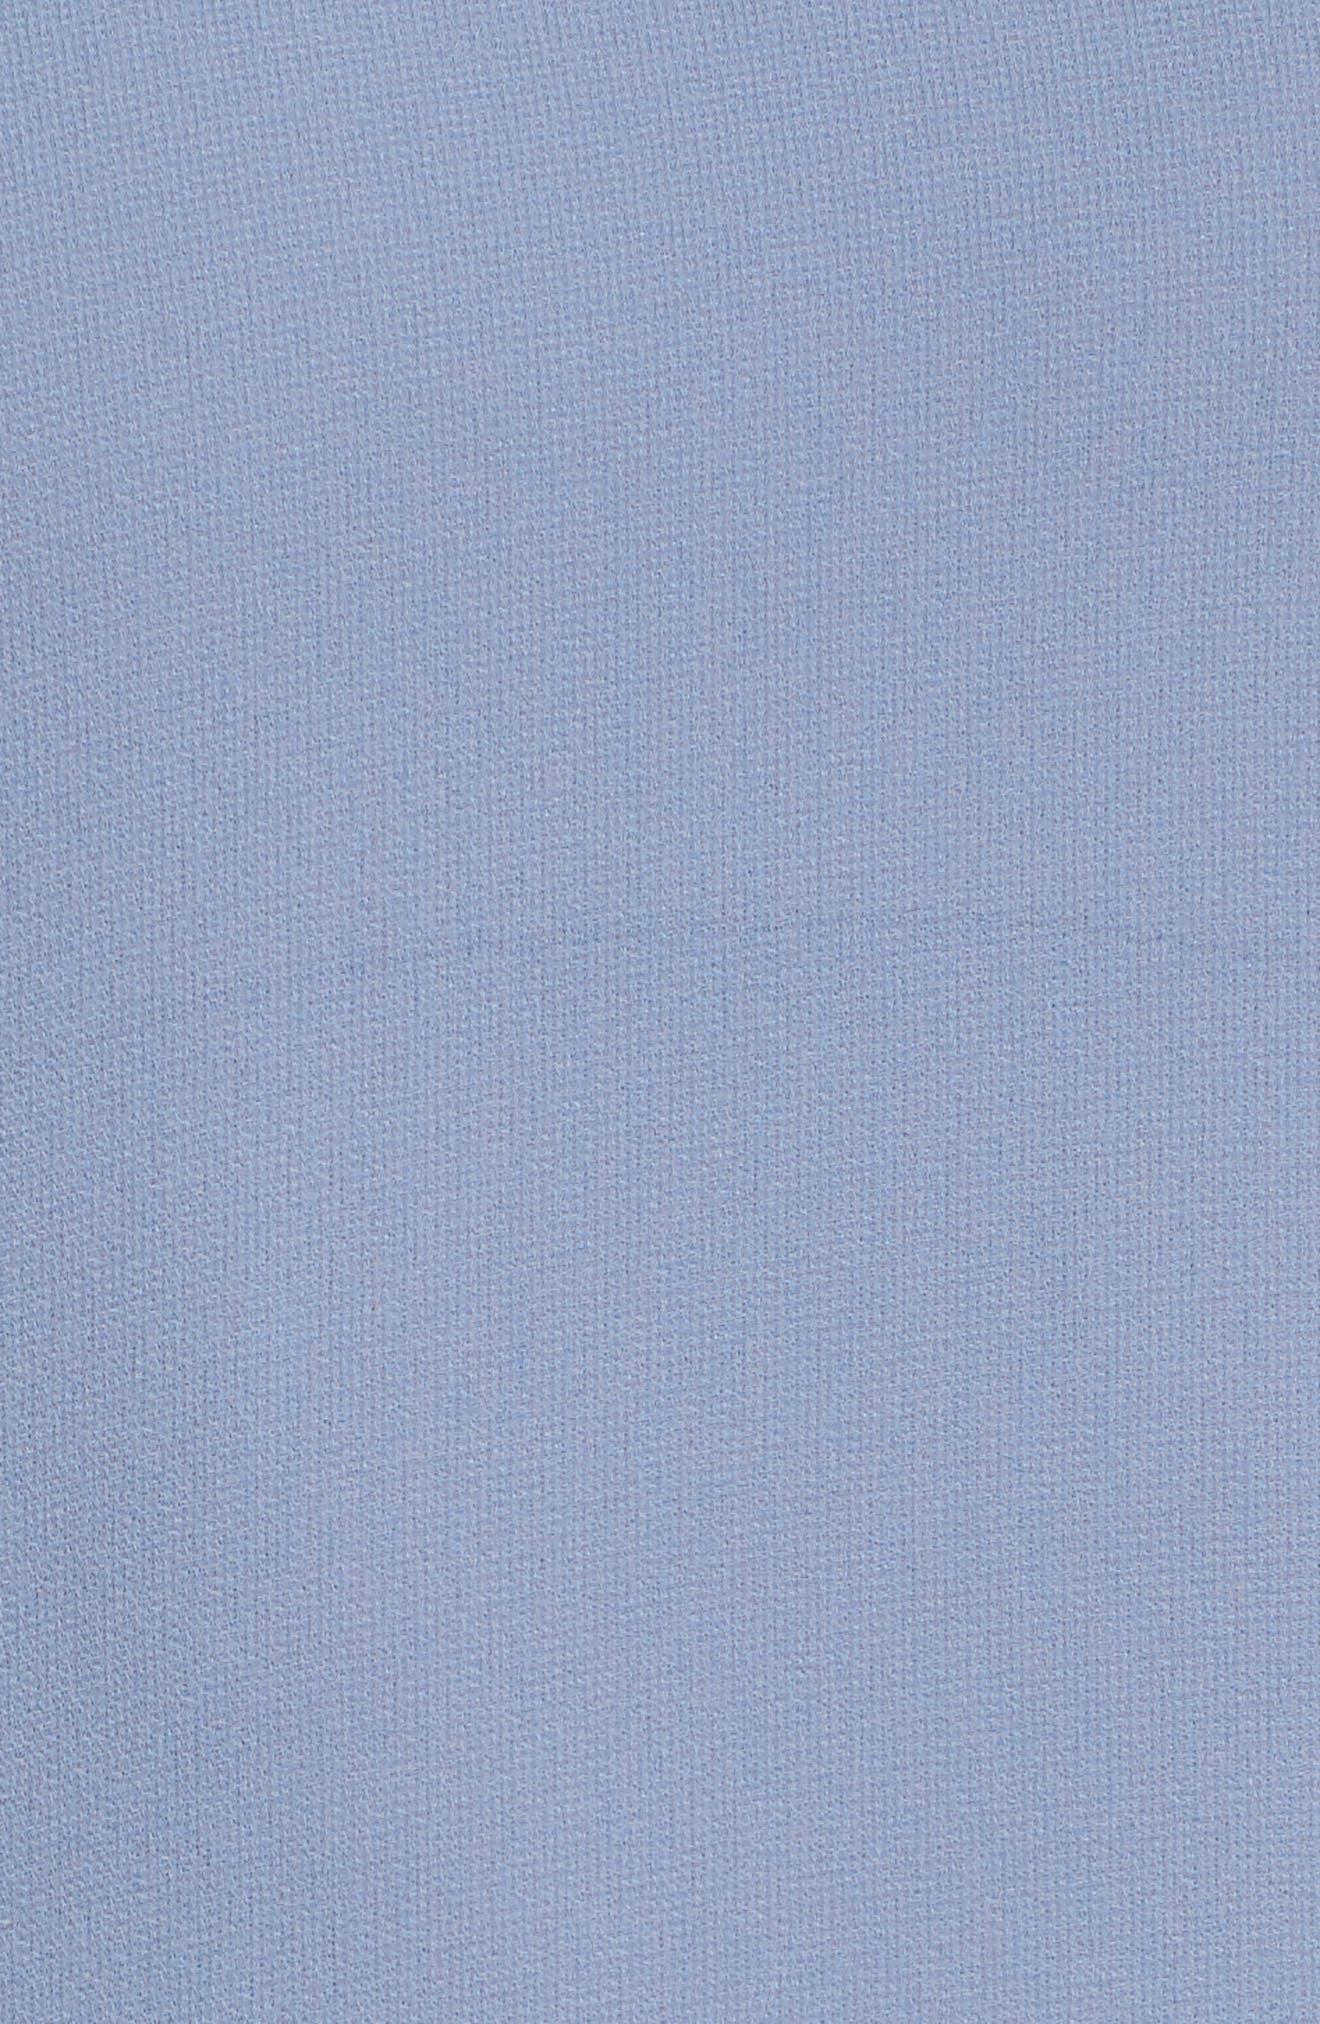 Ruffle Sleeve Halter Gown,                             Alternate thumbnail 5, color,                             420